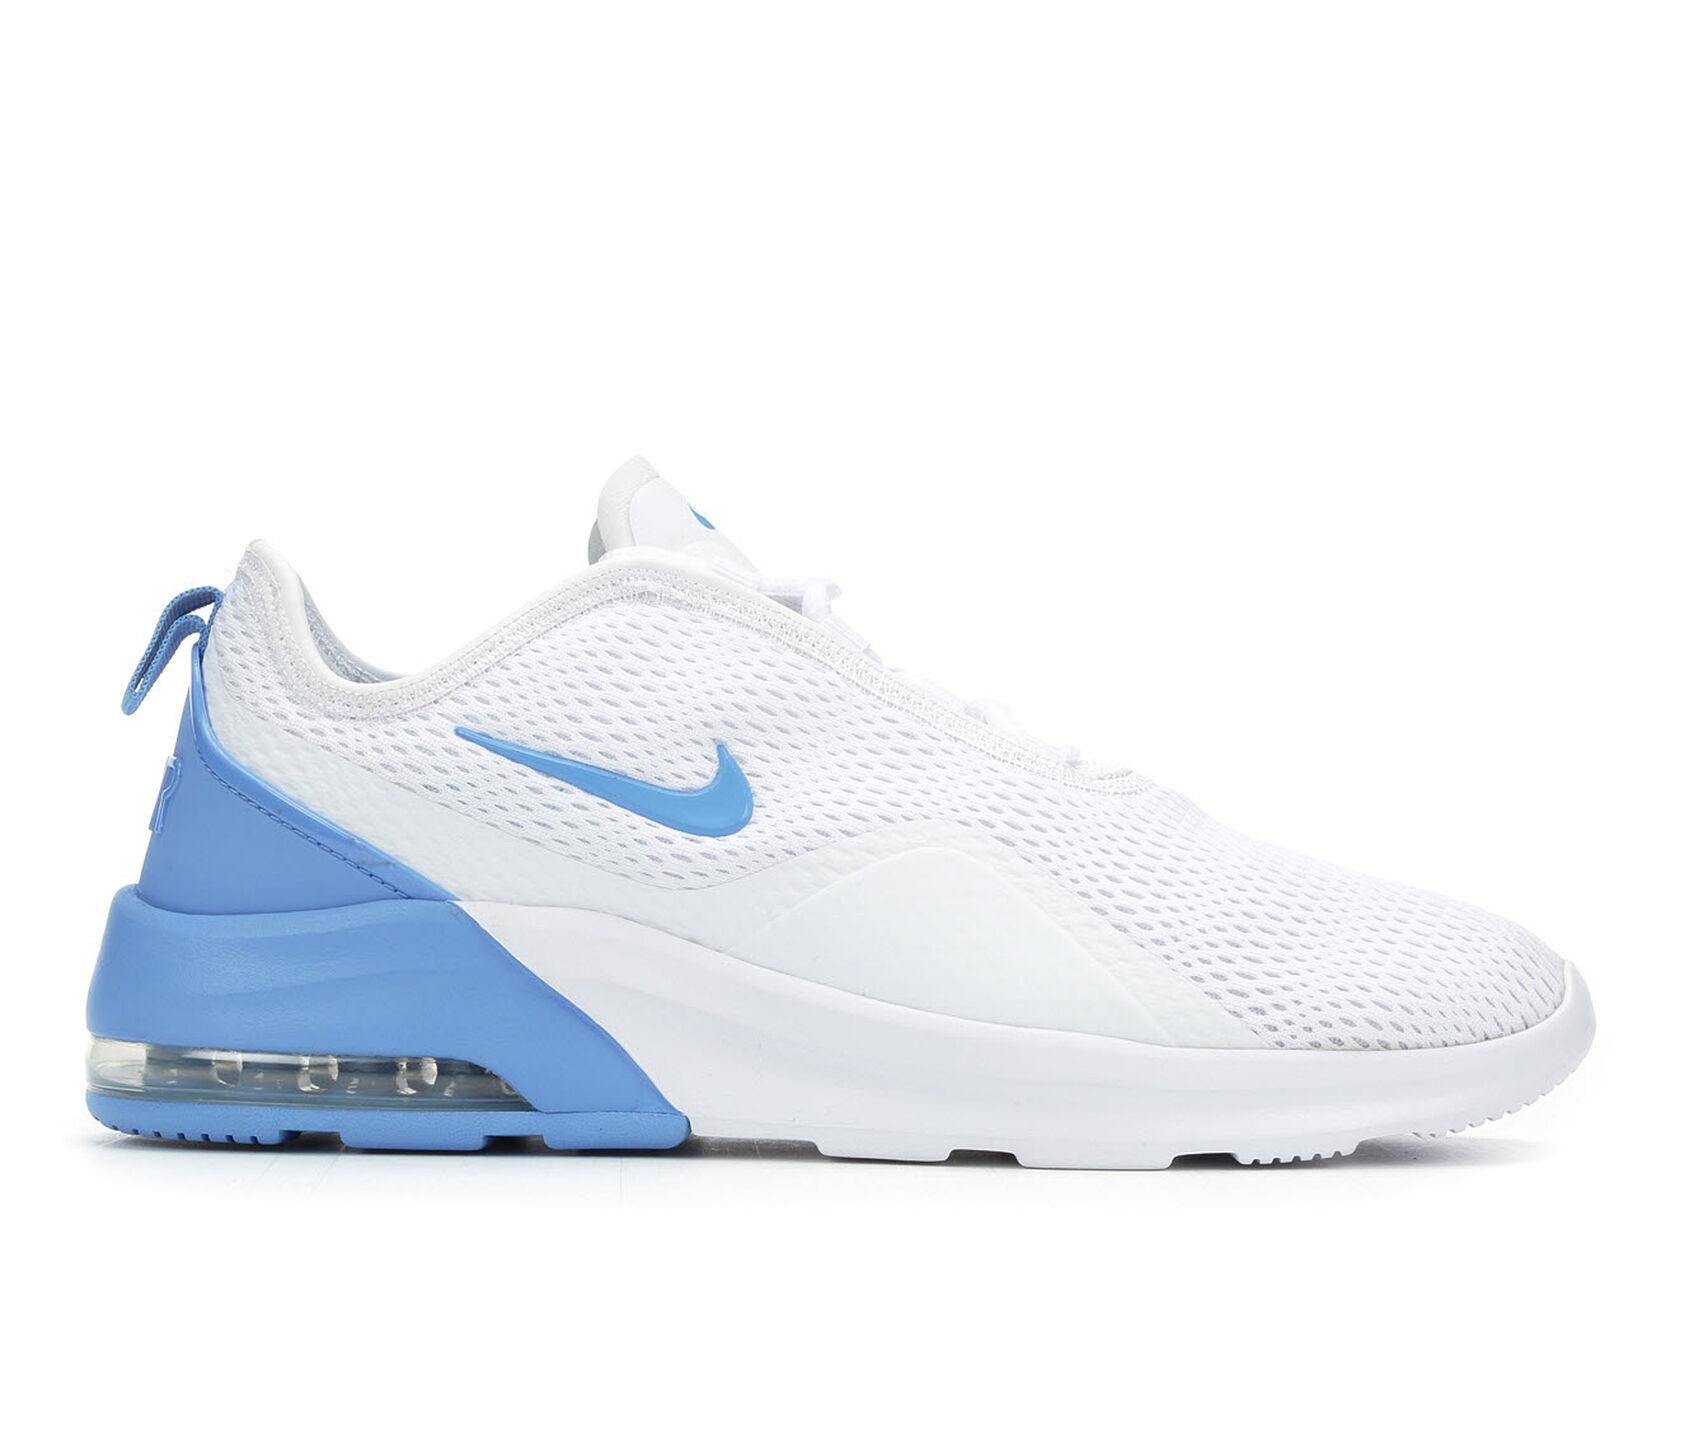 new photos 8c8d5 e2ac3 Men s Nike Air Max Motion 2 Sneakers   Shoe Carnival